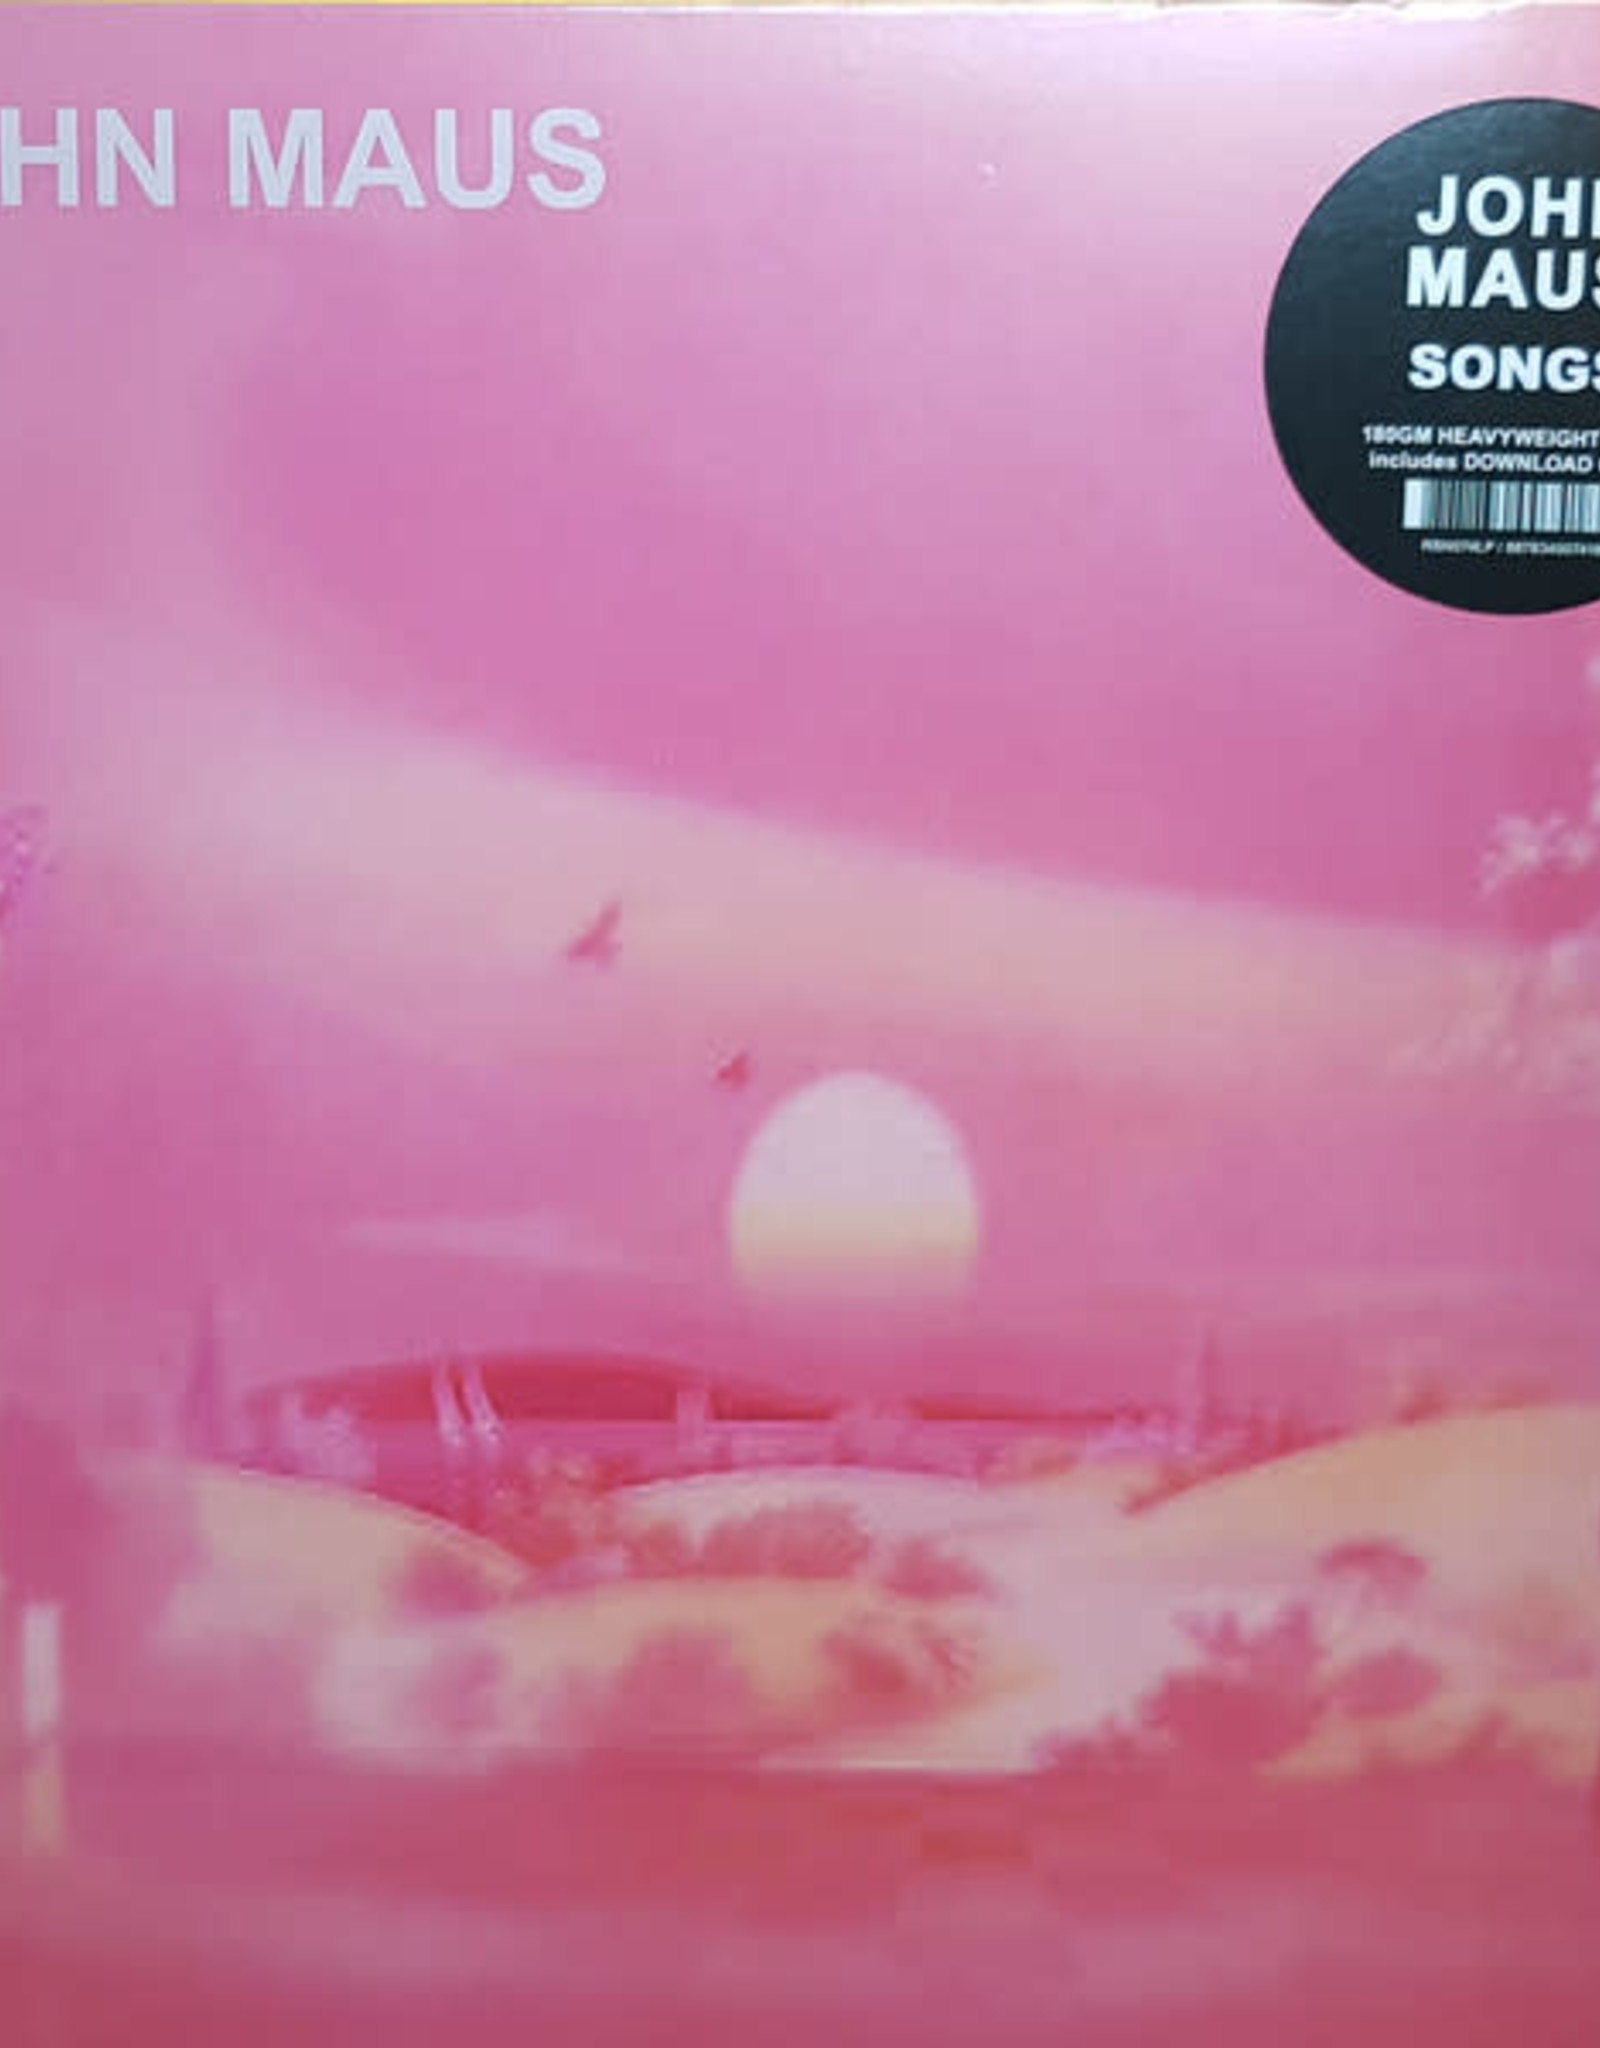 John Maus - Songs